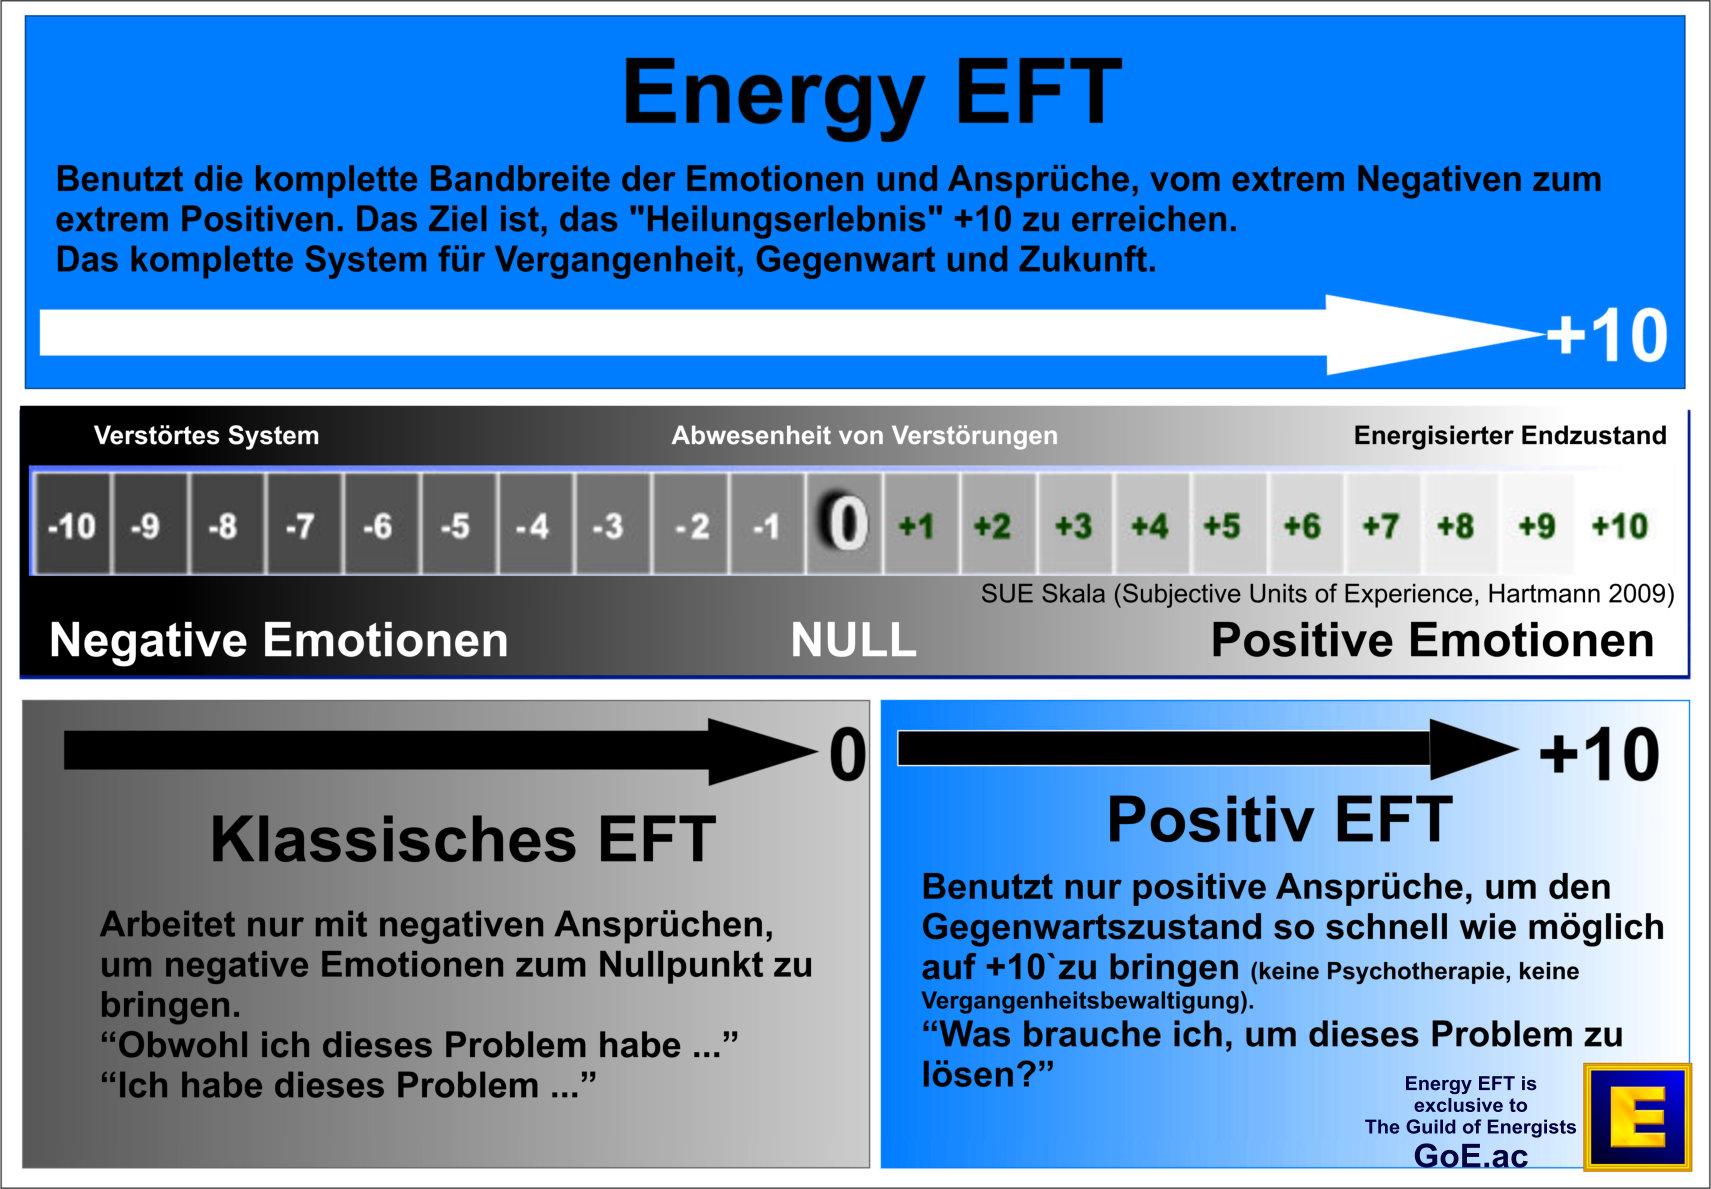 Energy EFT, Klassisches EFT und Positive EFT - Was Ist Der Unterschied?